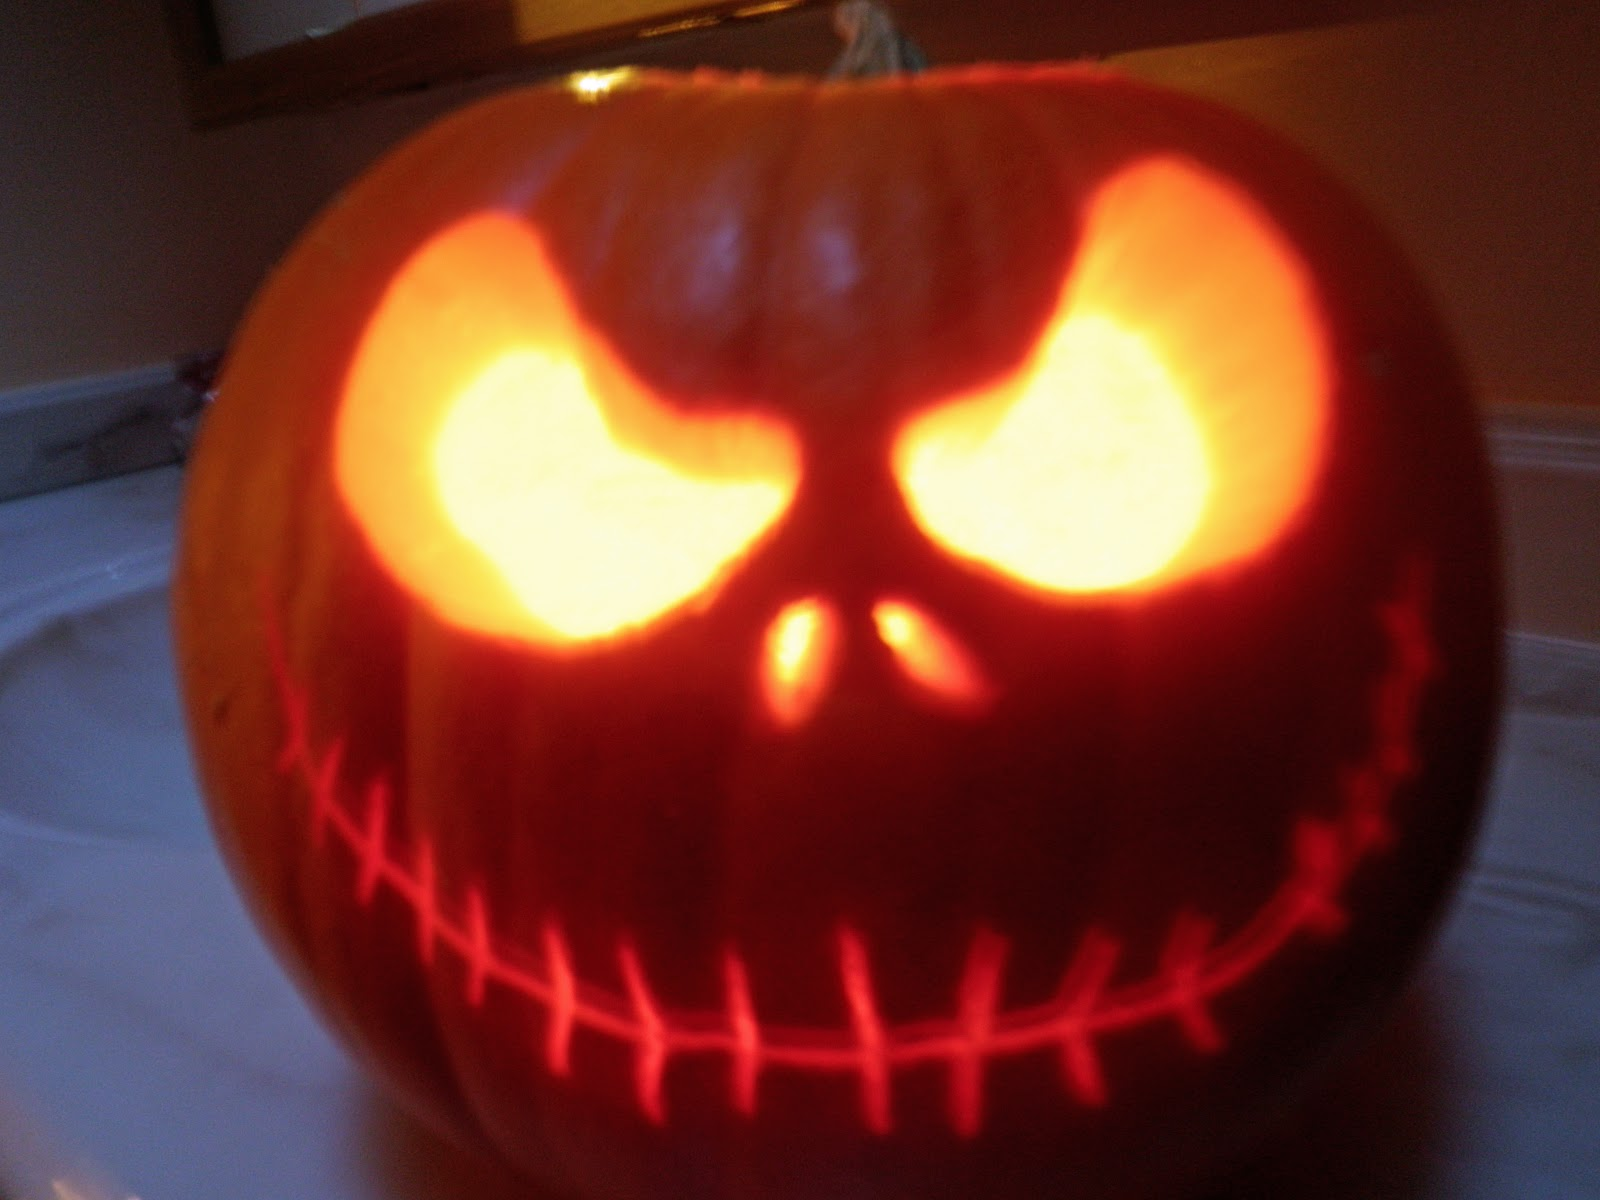 i did the nightmare before christmas jack o lantern - Nightmare Before Christmas Jack O Lantern